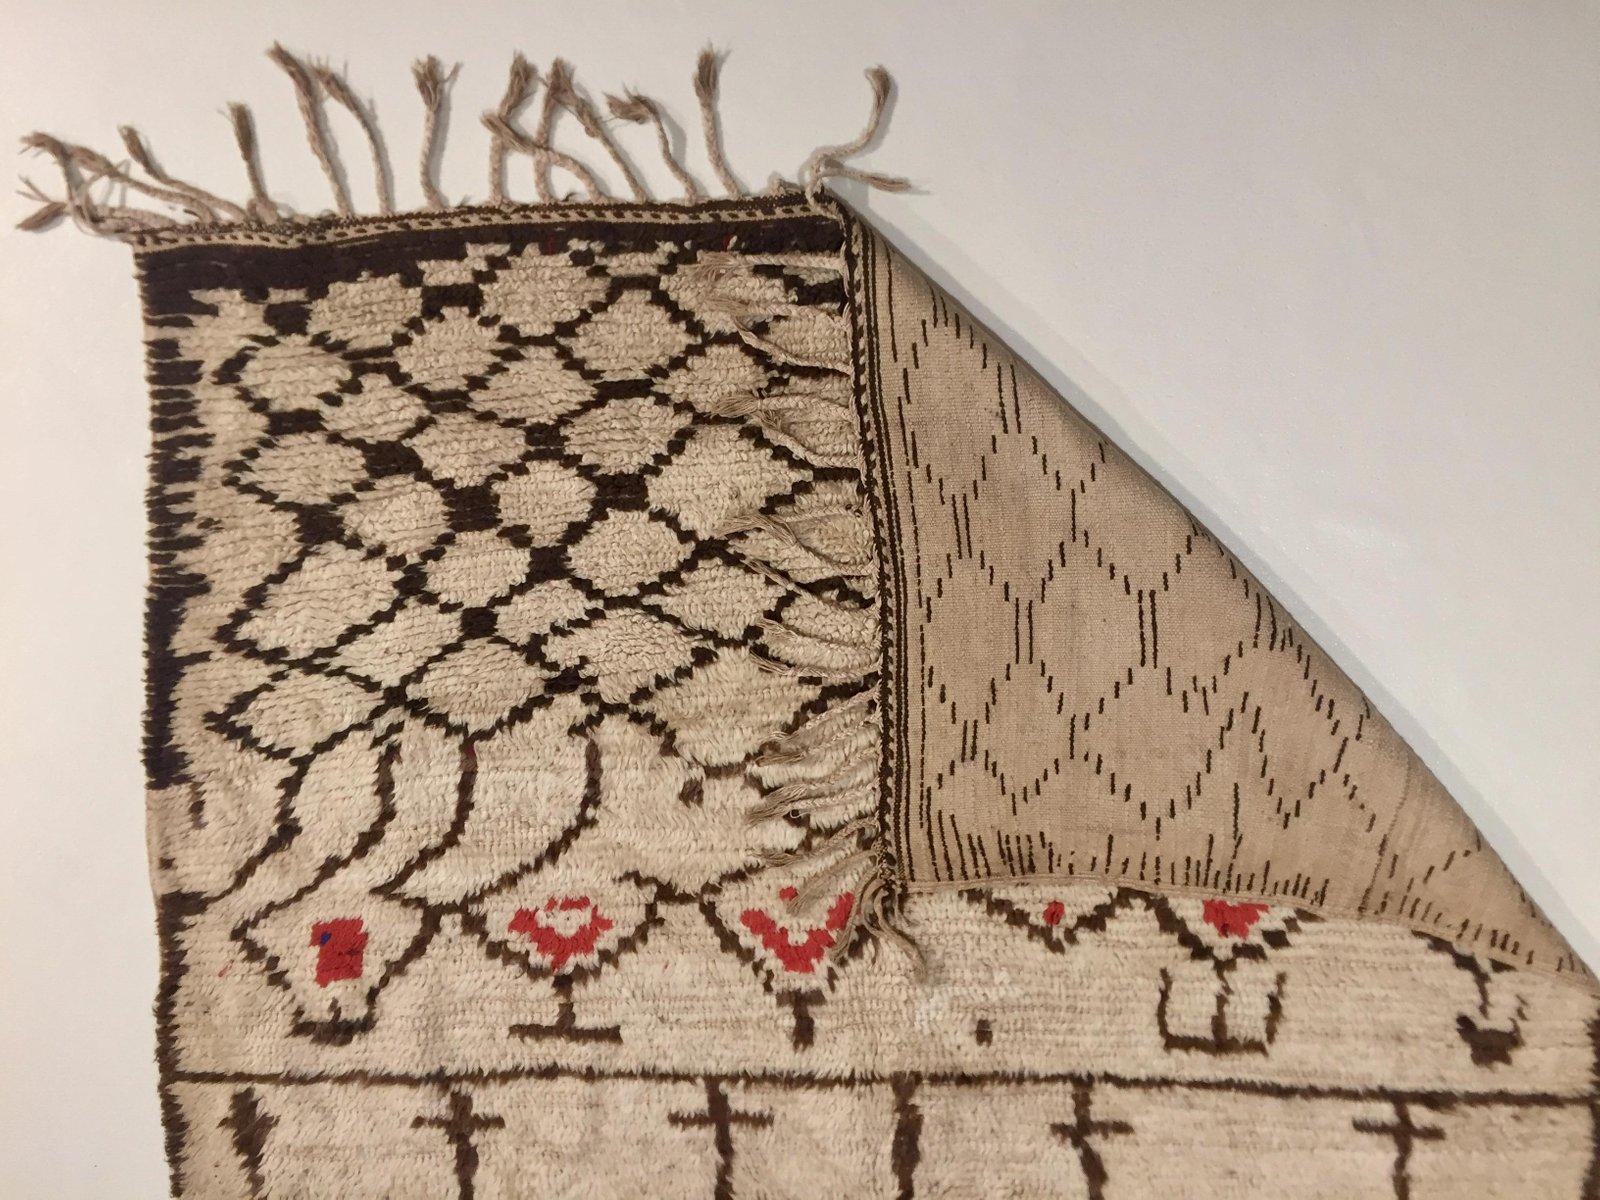 vintage beni ourain berber teppich bei pamono kaufen. Black Bedroom Furniture Sets. Home Design Ideas